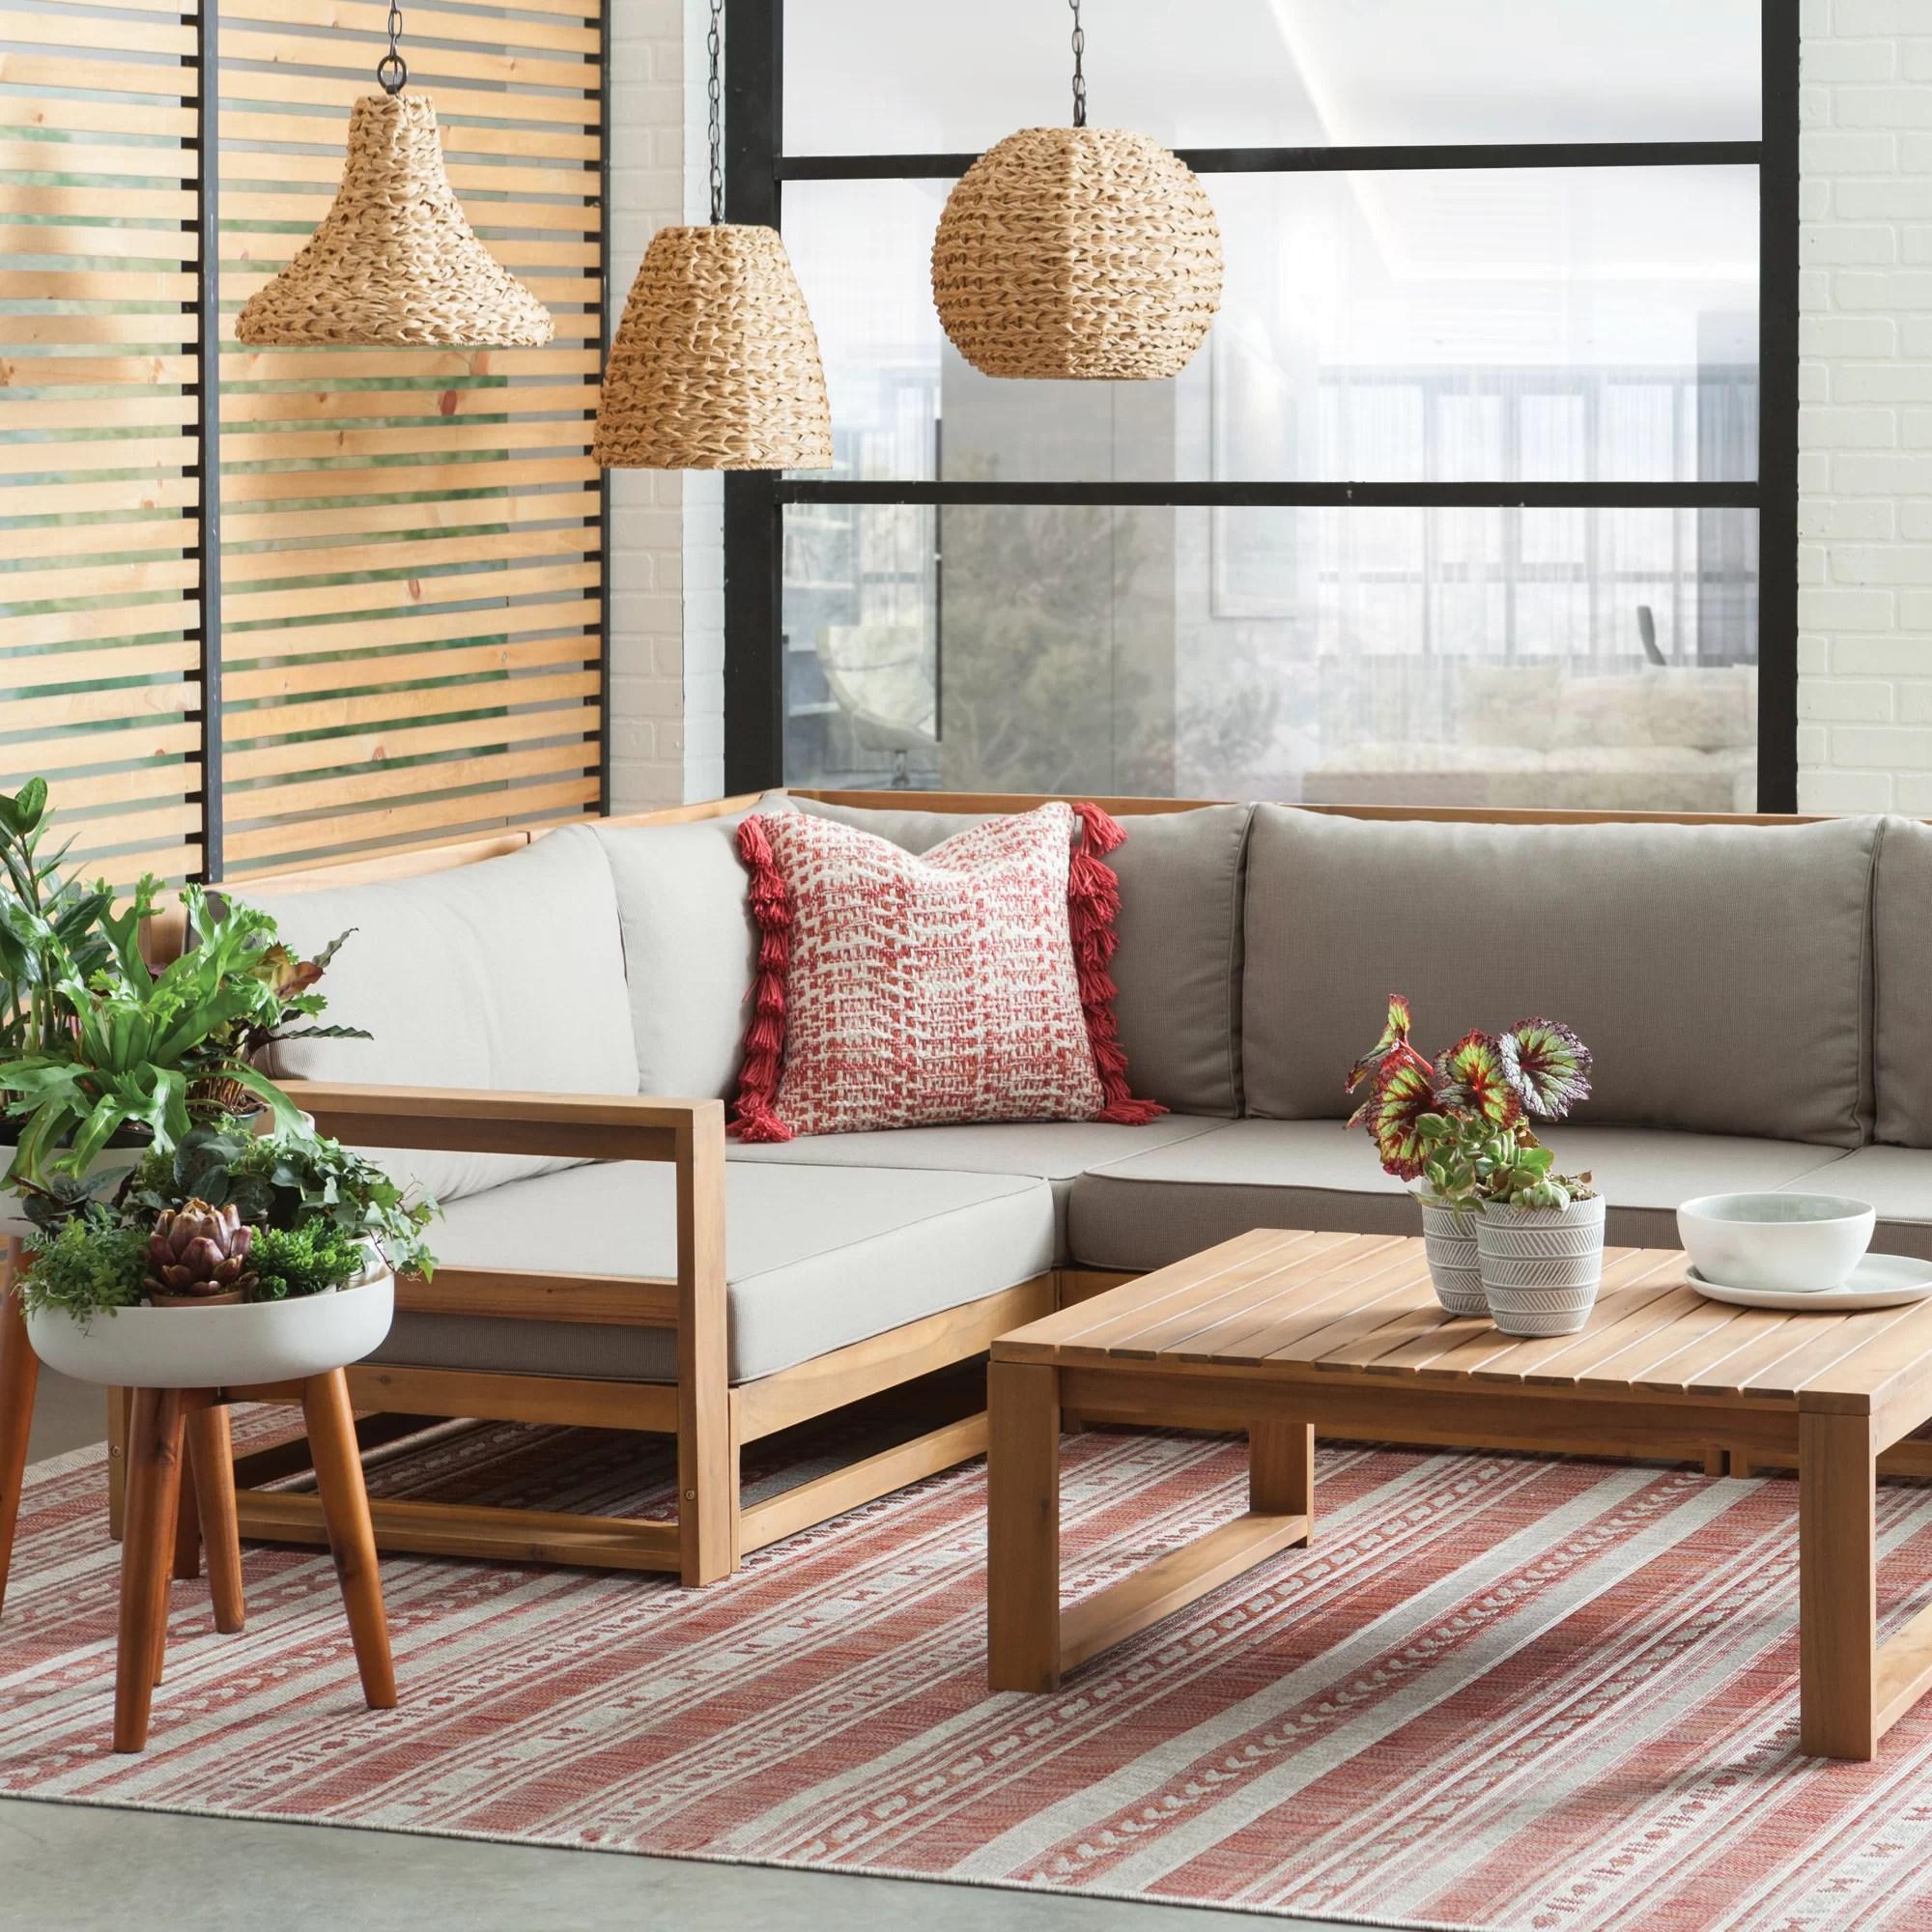 modern outdoor furniture + decor | allmodern